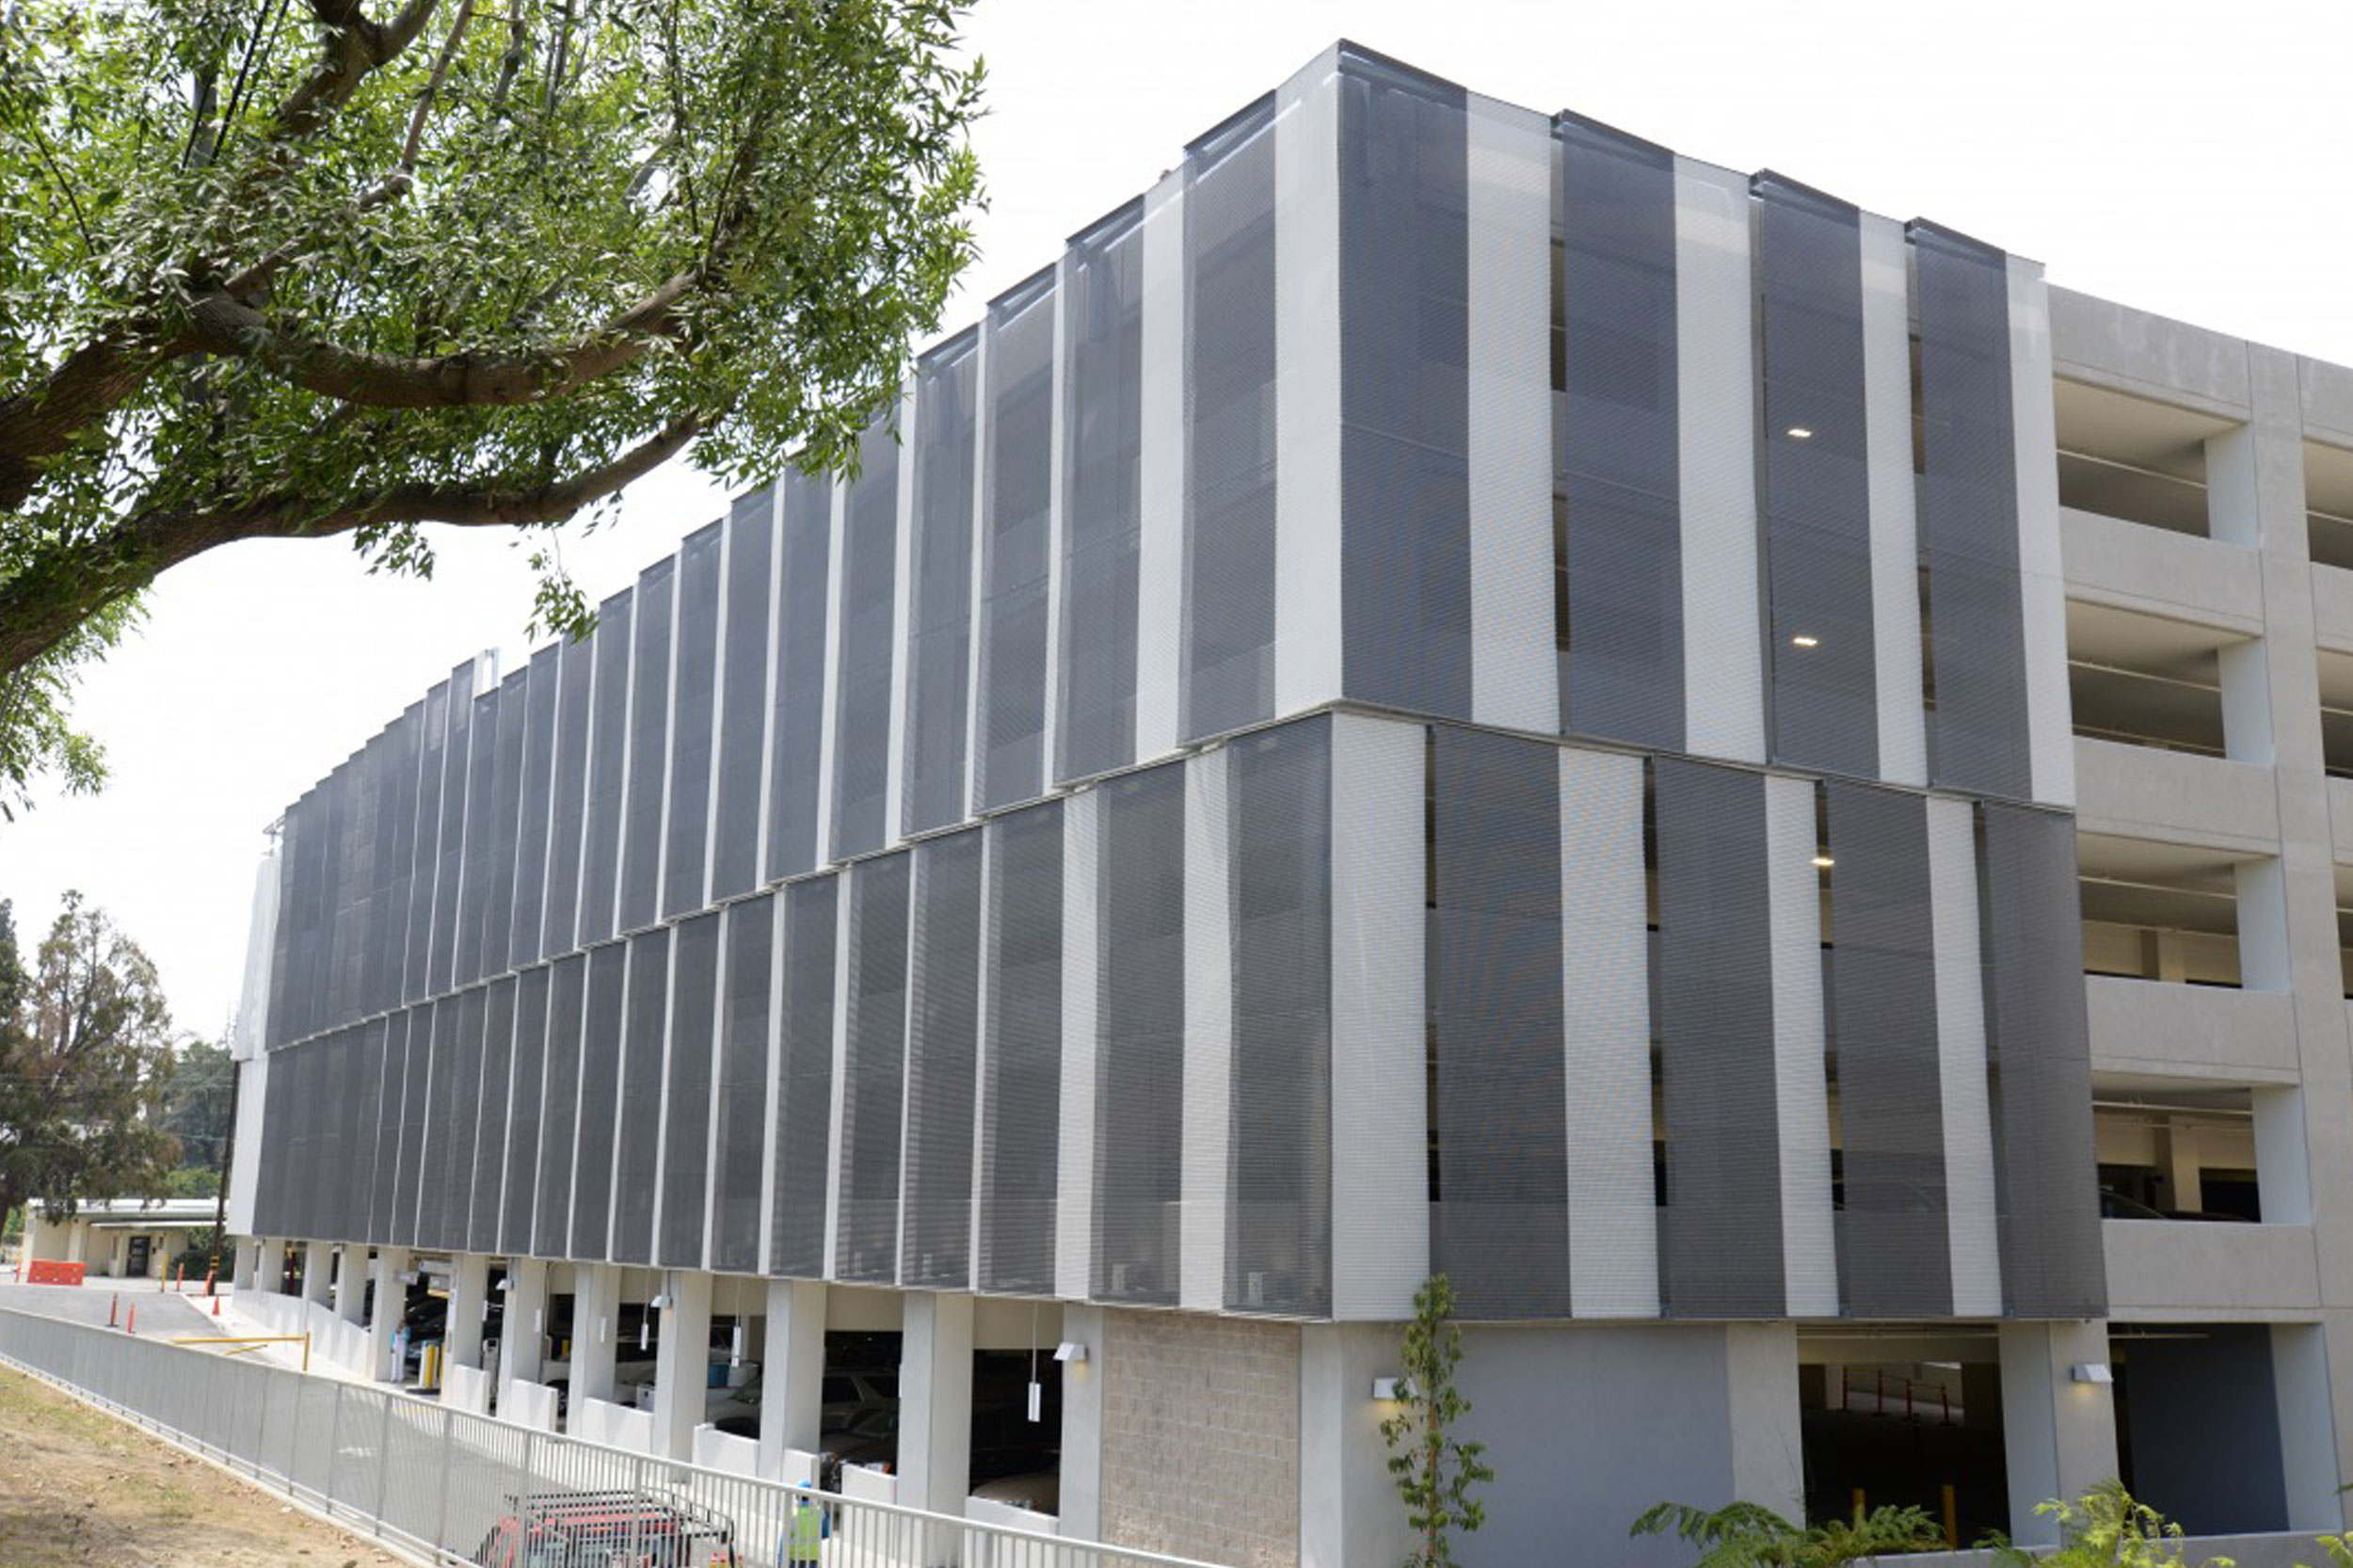 Loma Linda University Parking Garage with Kaynemaile architectural mesh